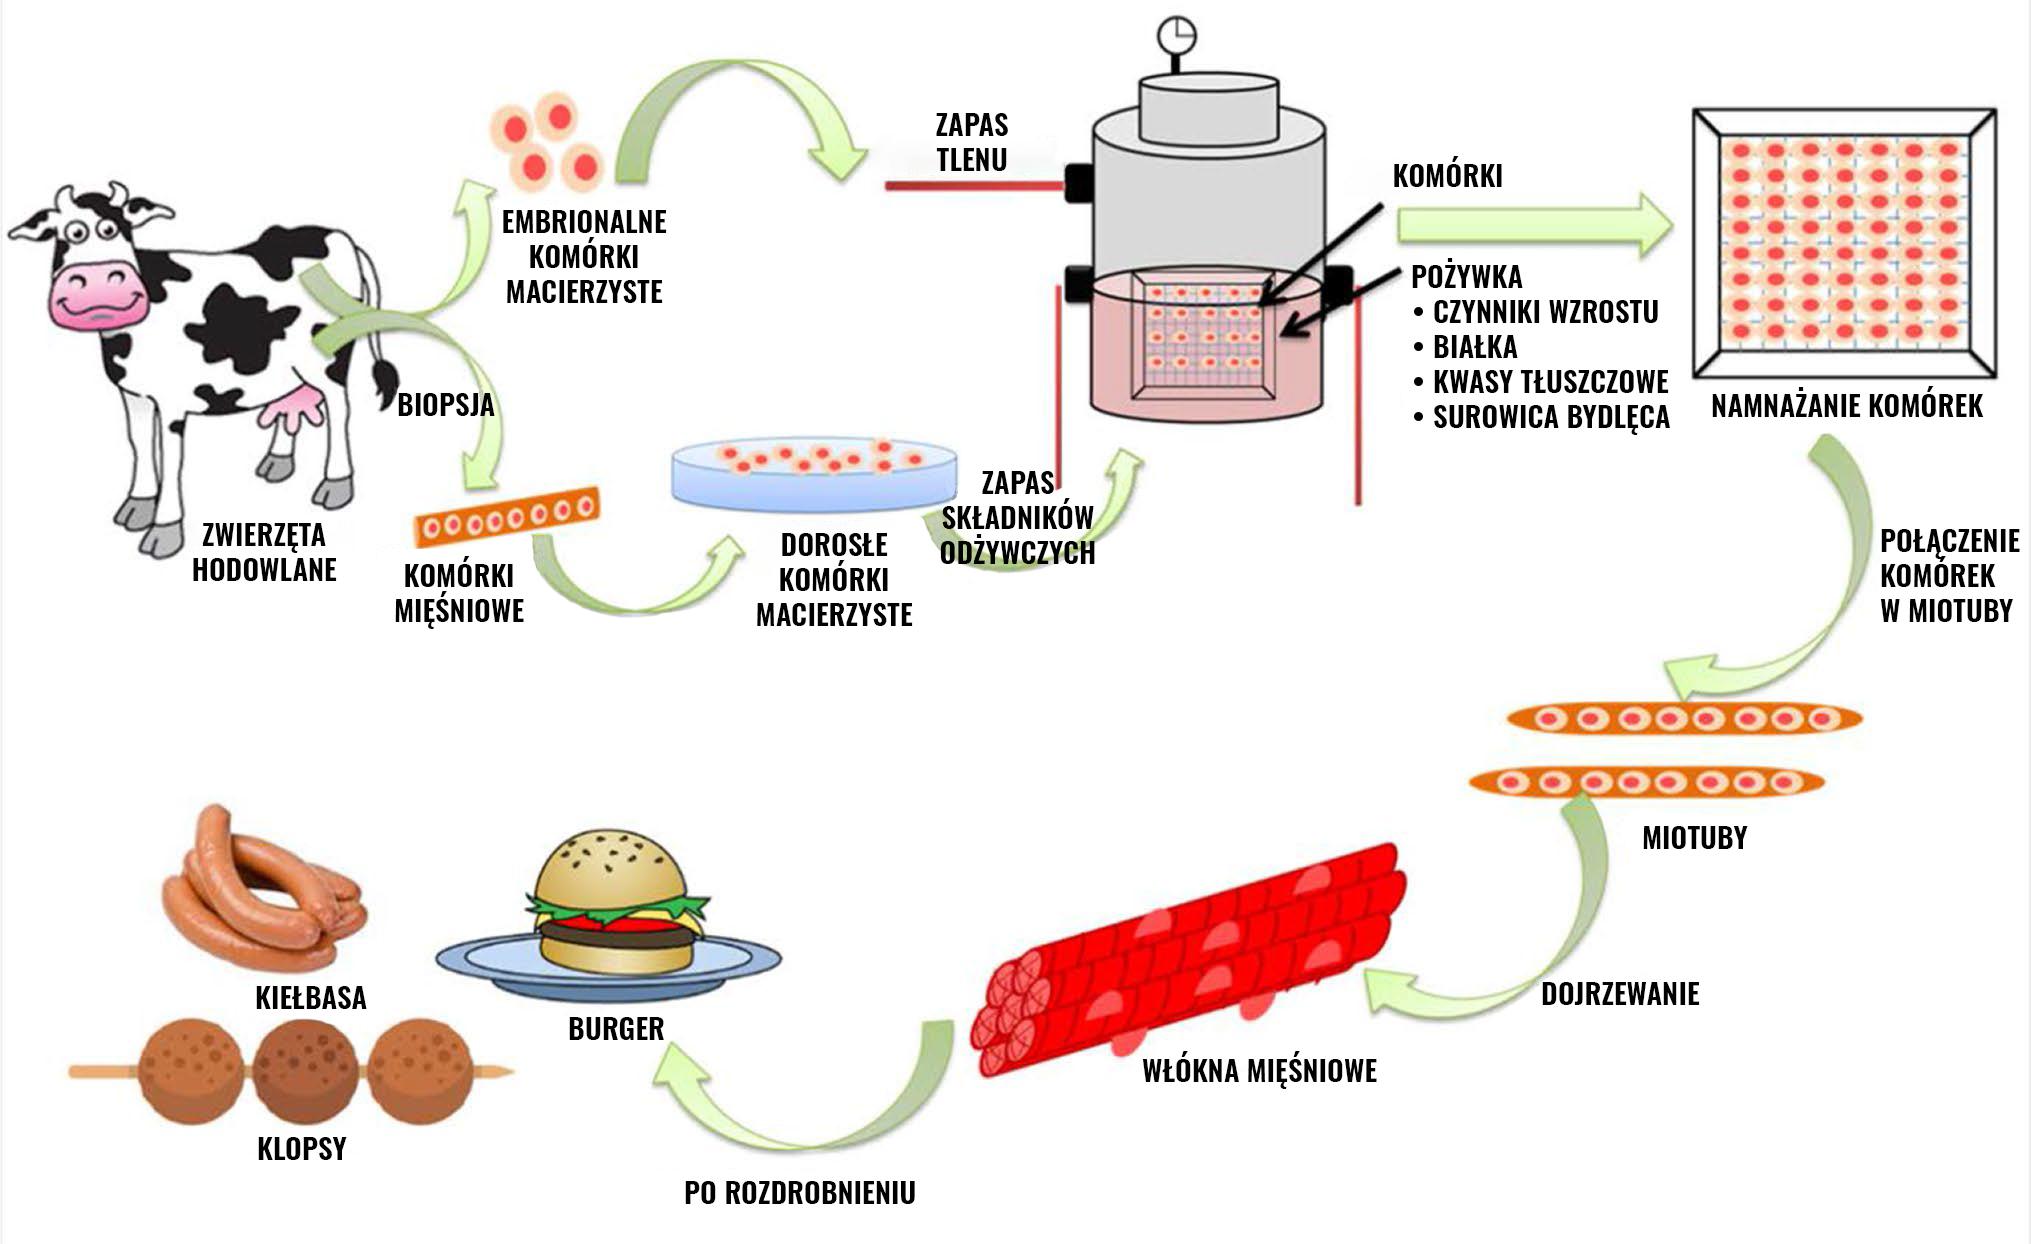 Proces powstawania mięsa in vitro